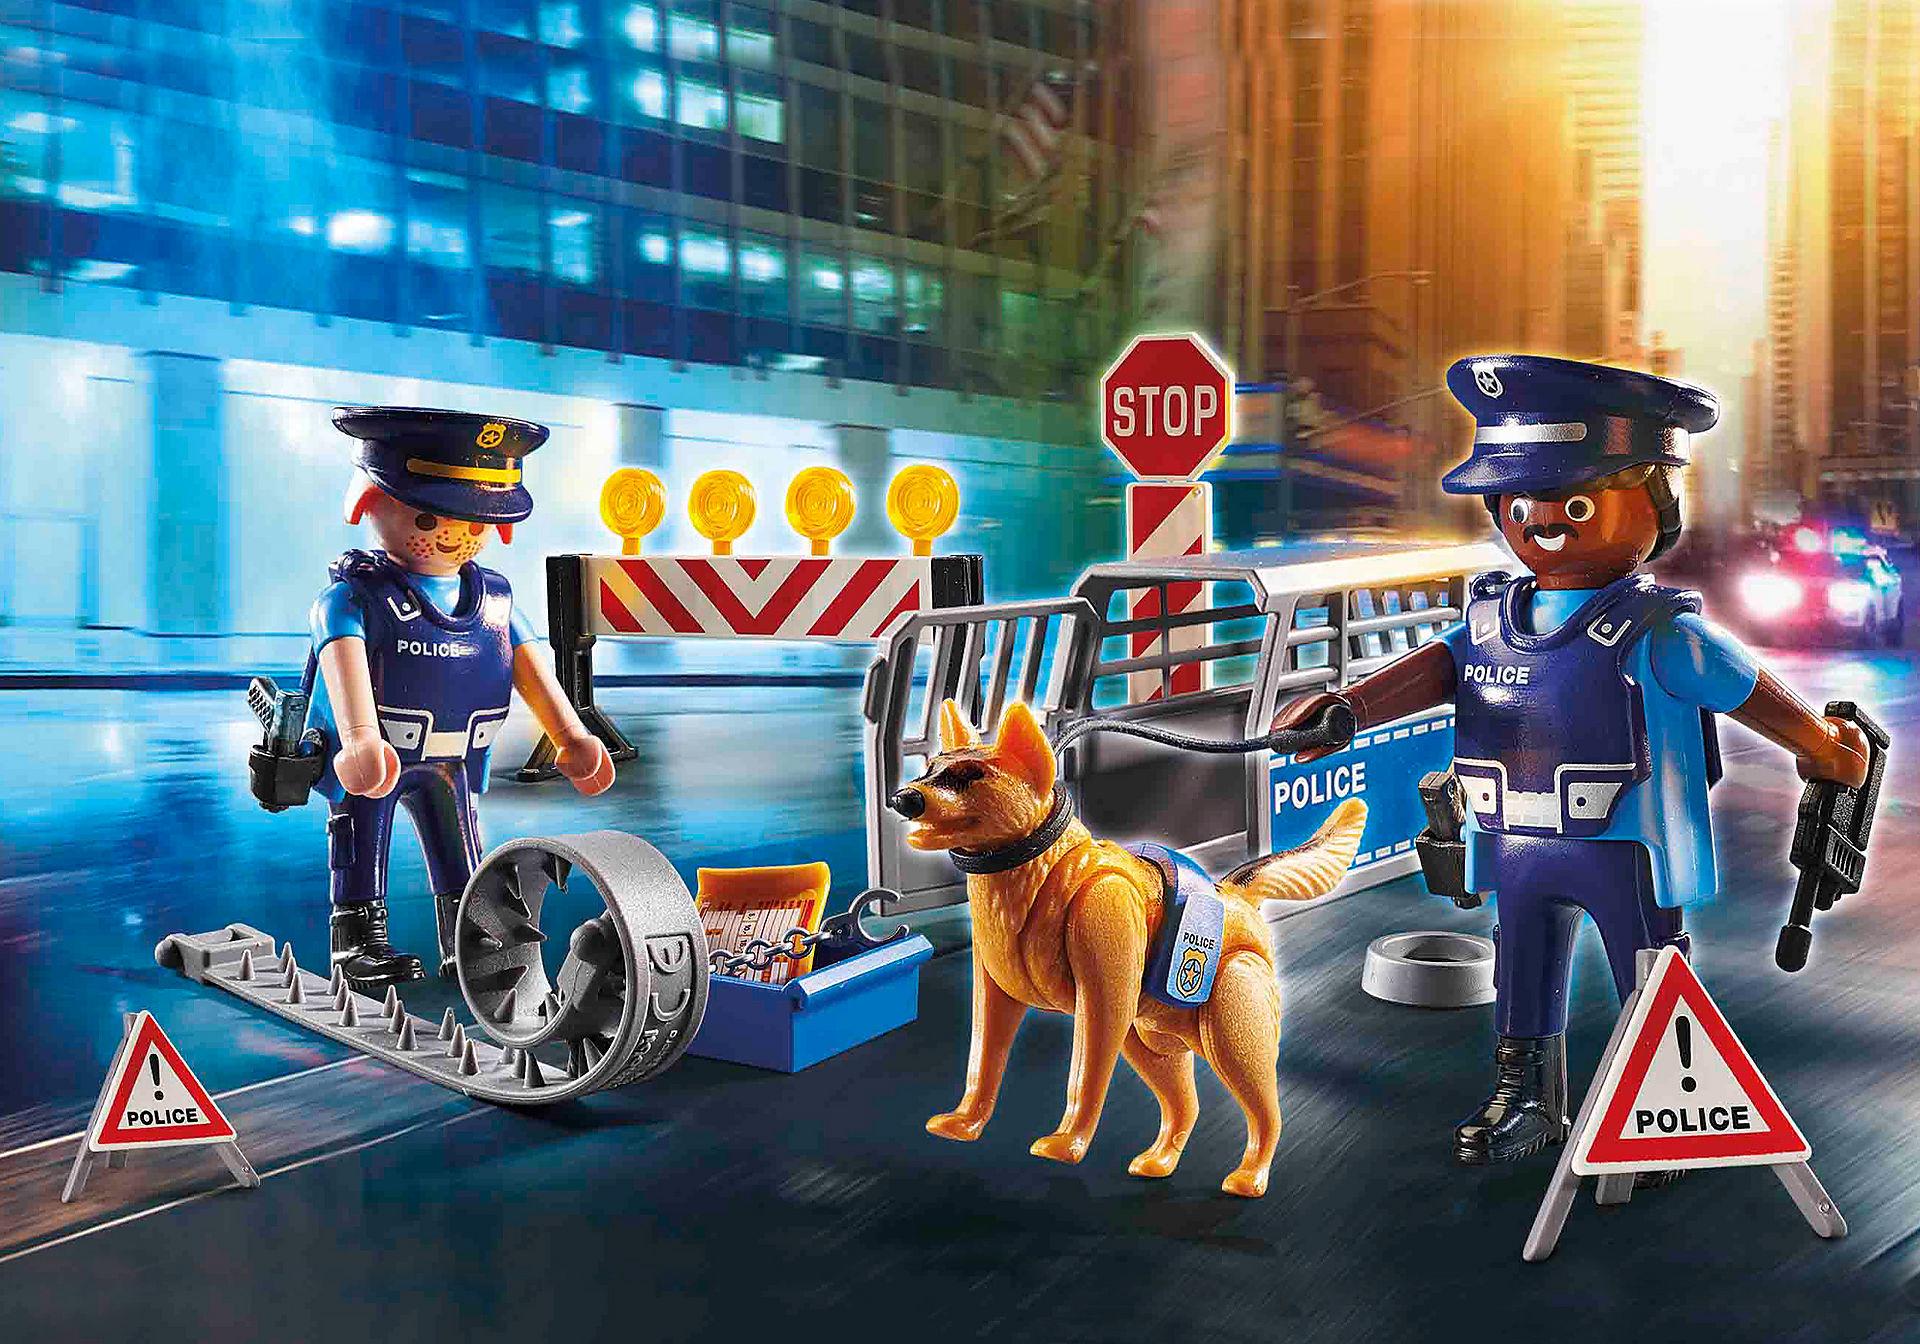 http://media.playmobil.com/i/playmobil/6878_product_detail/Polizei-Straßensperre